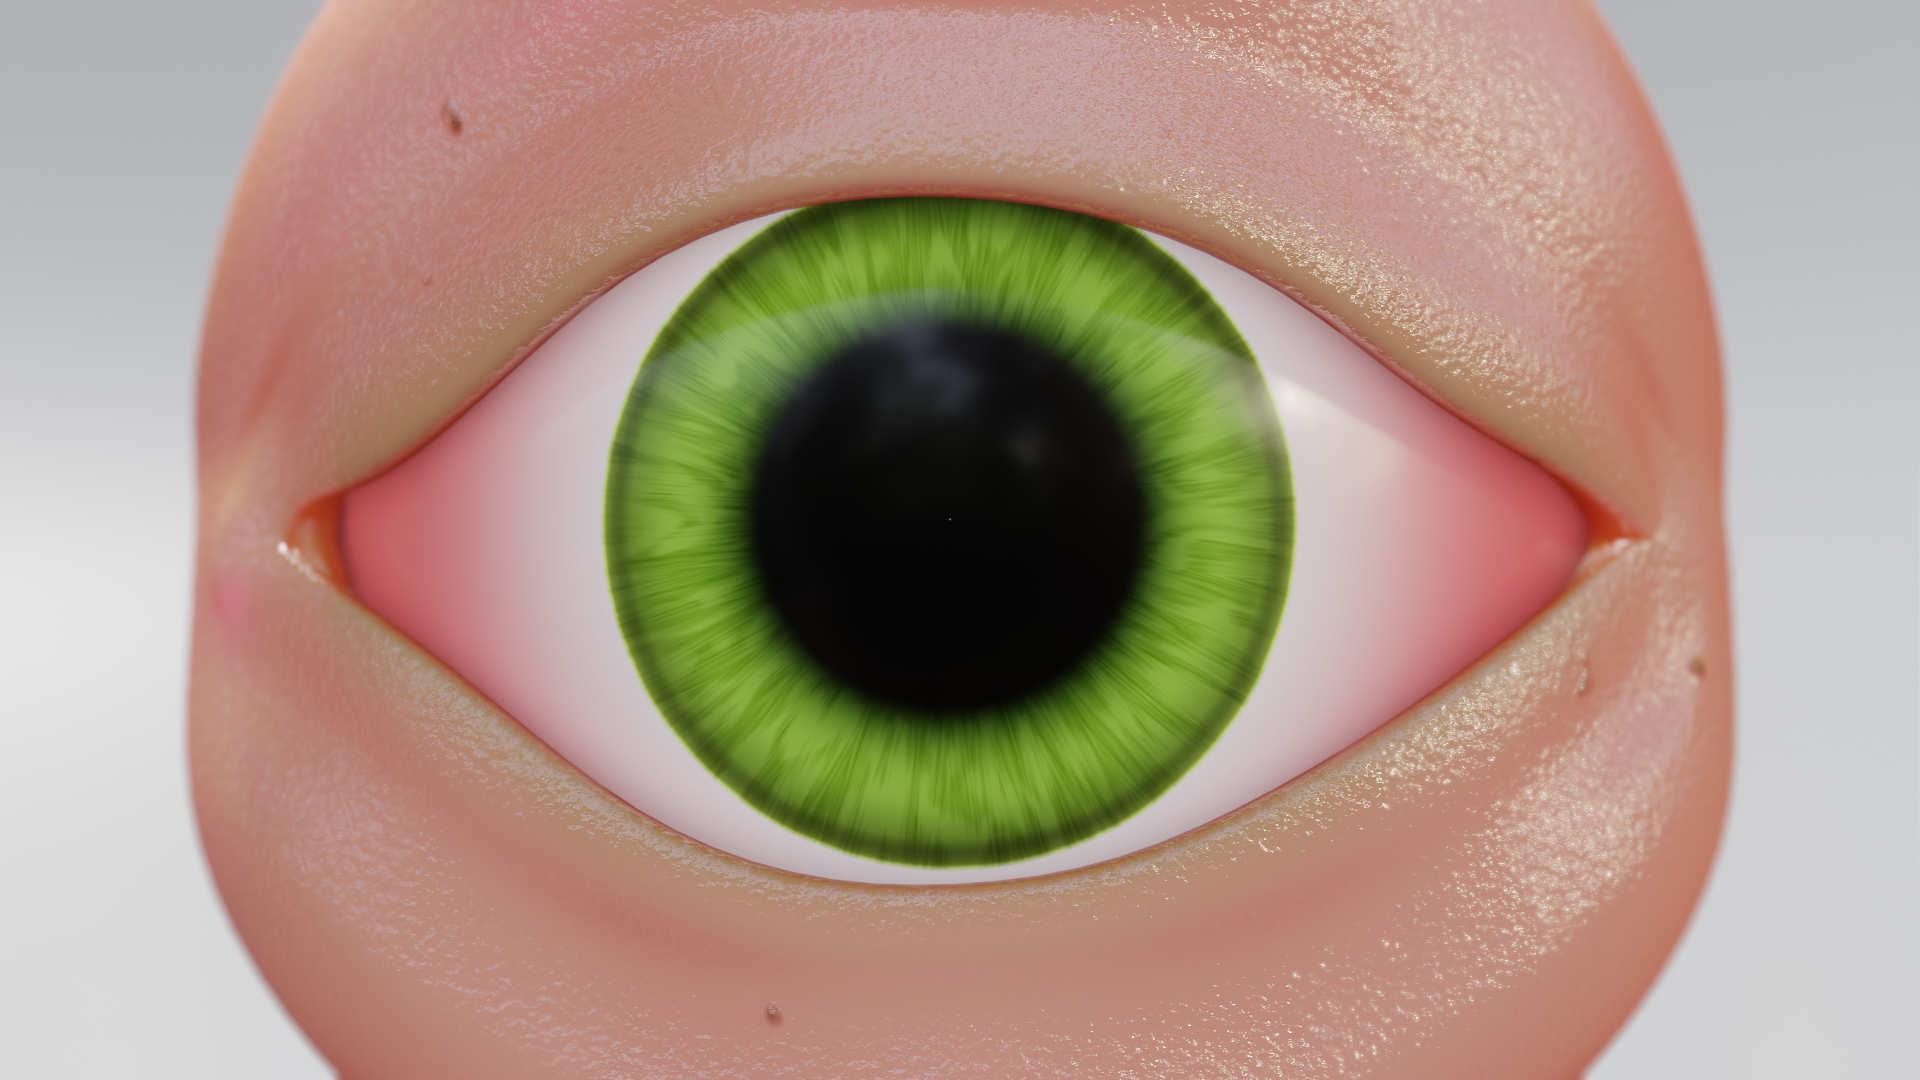 Eye_Procedural_007